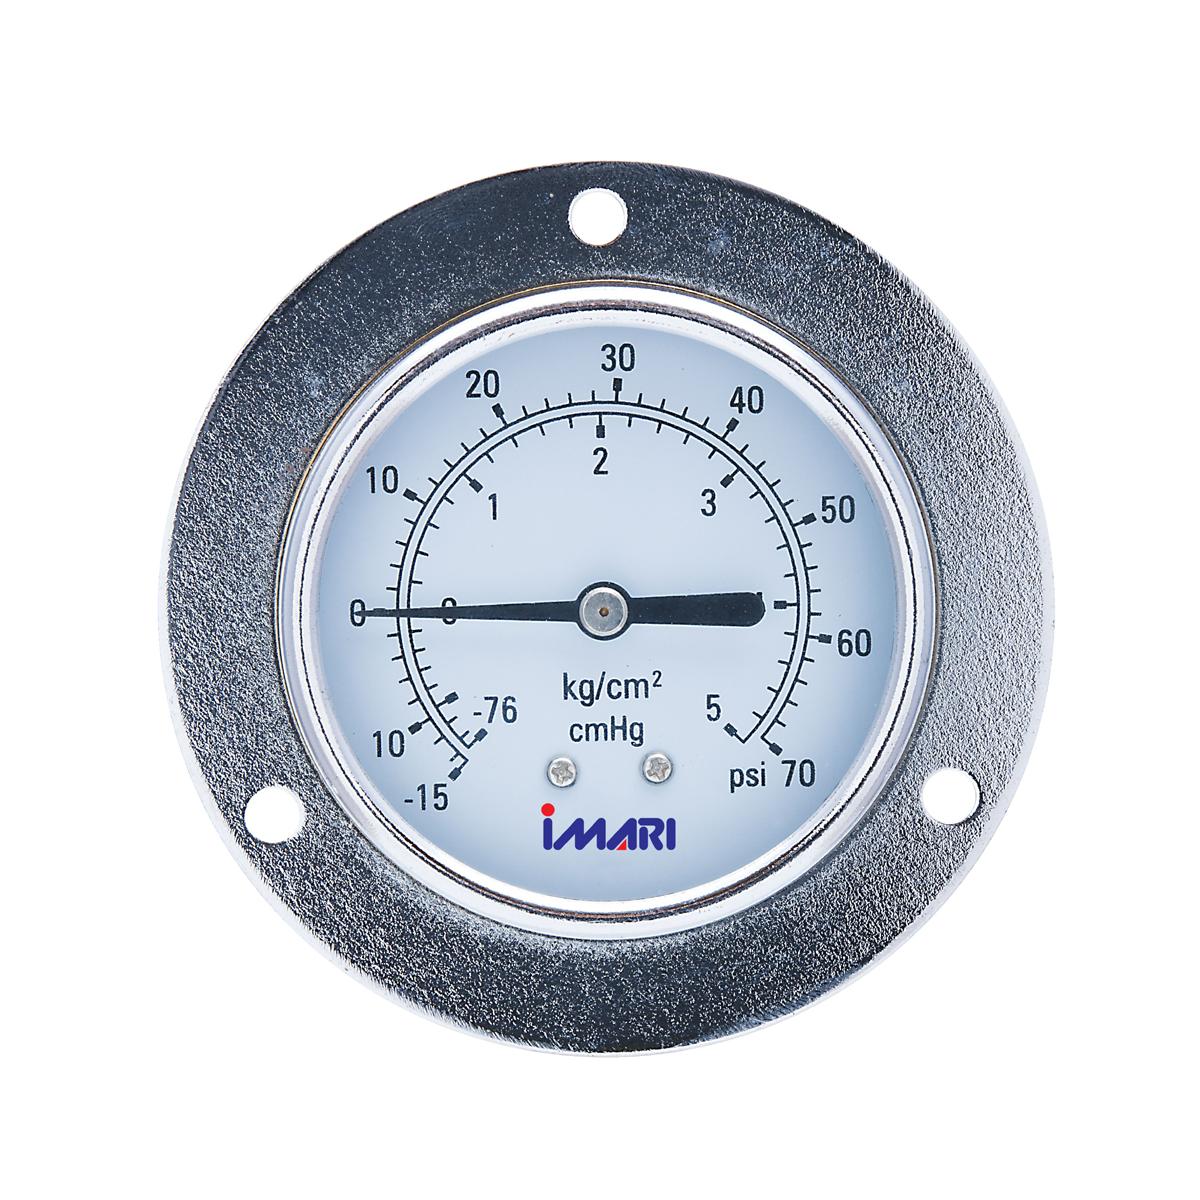 IMARI TYPE BD (COMPOUND) เกจ์วัดความดันและสุญญากาศ